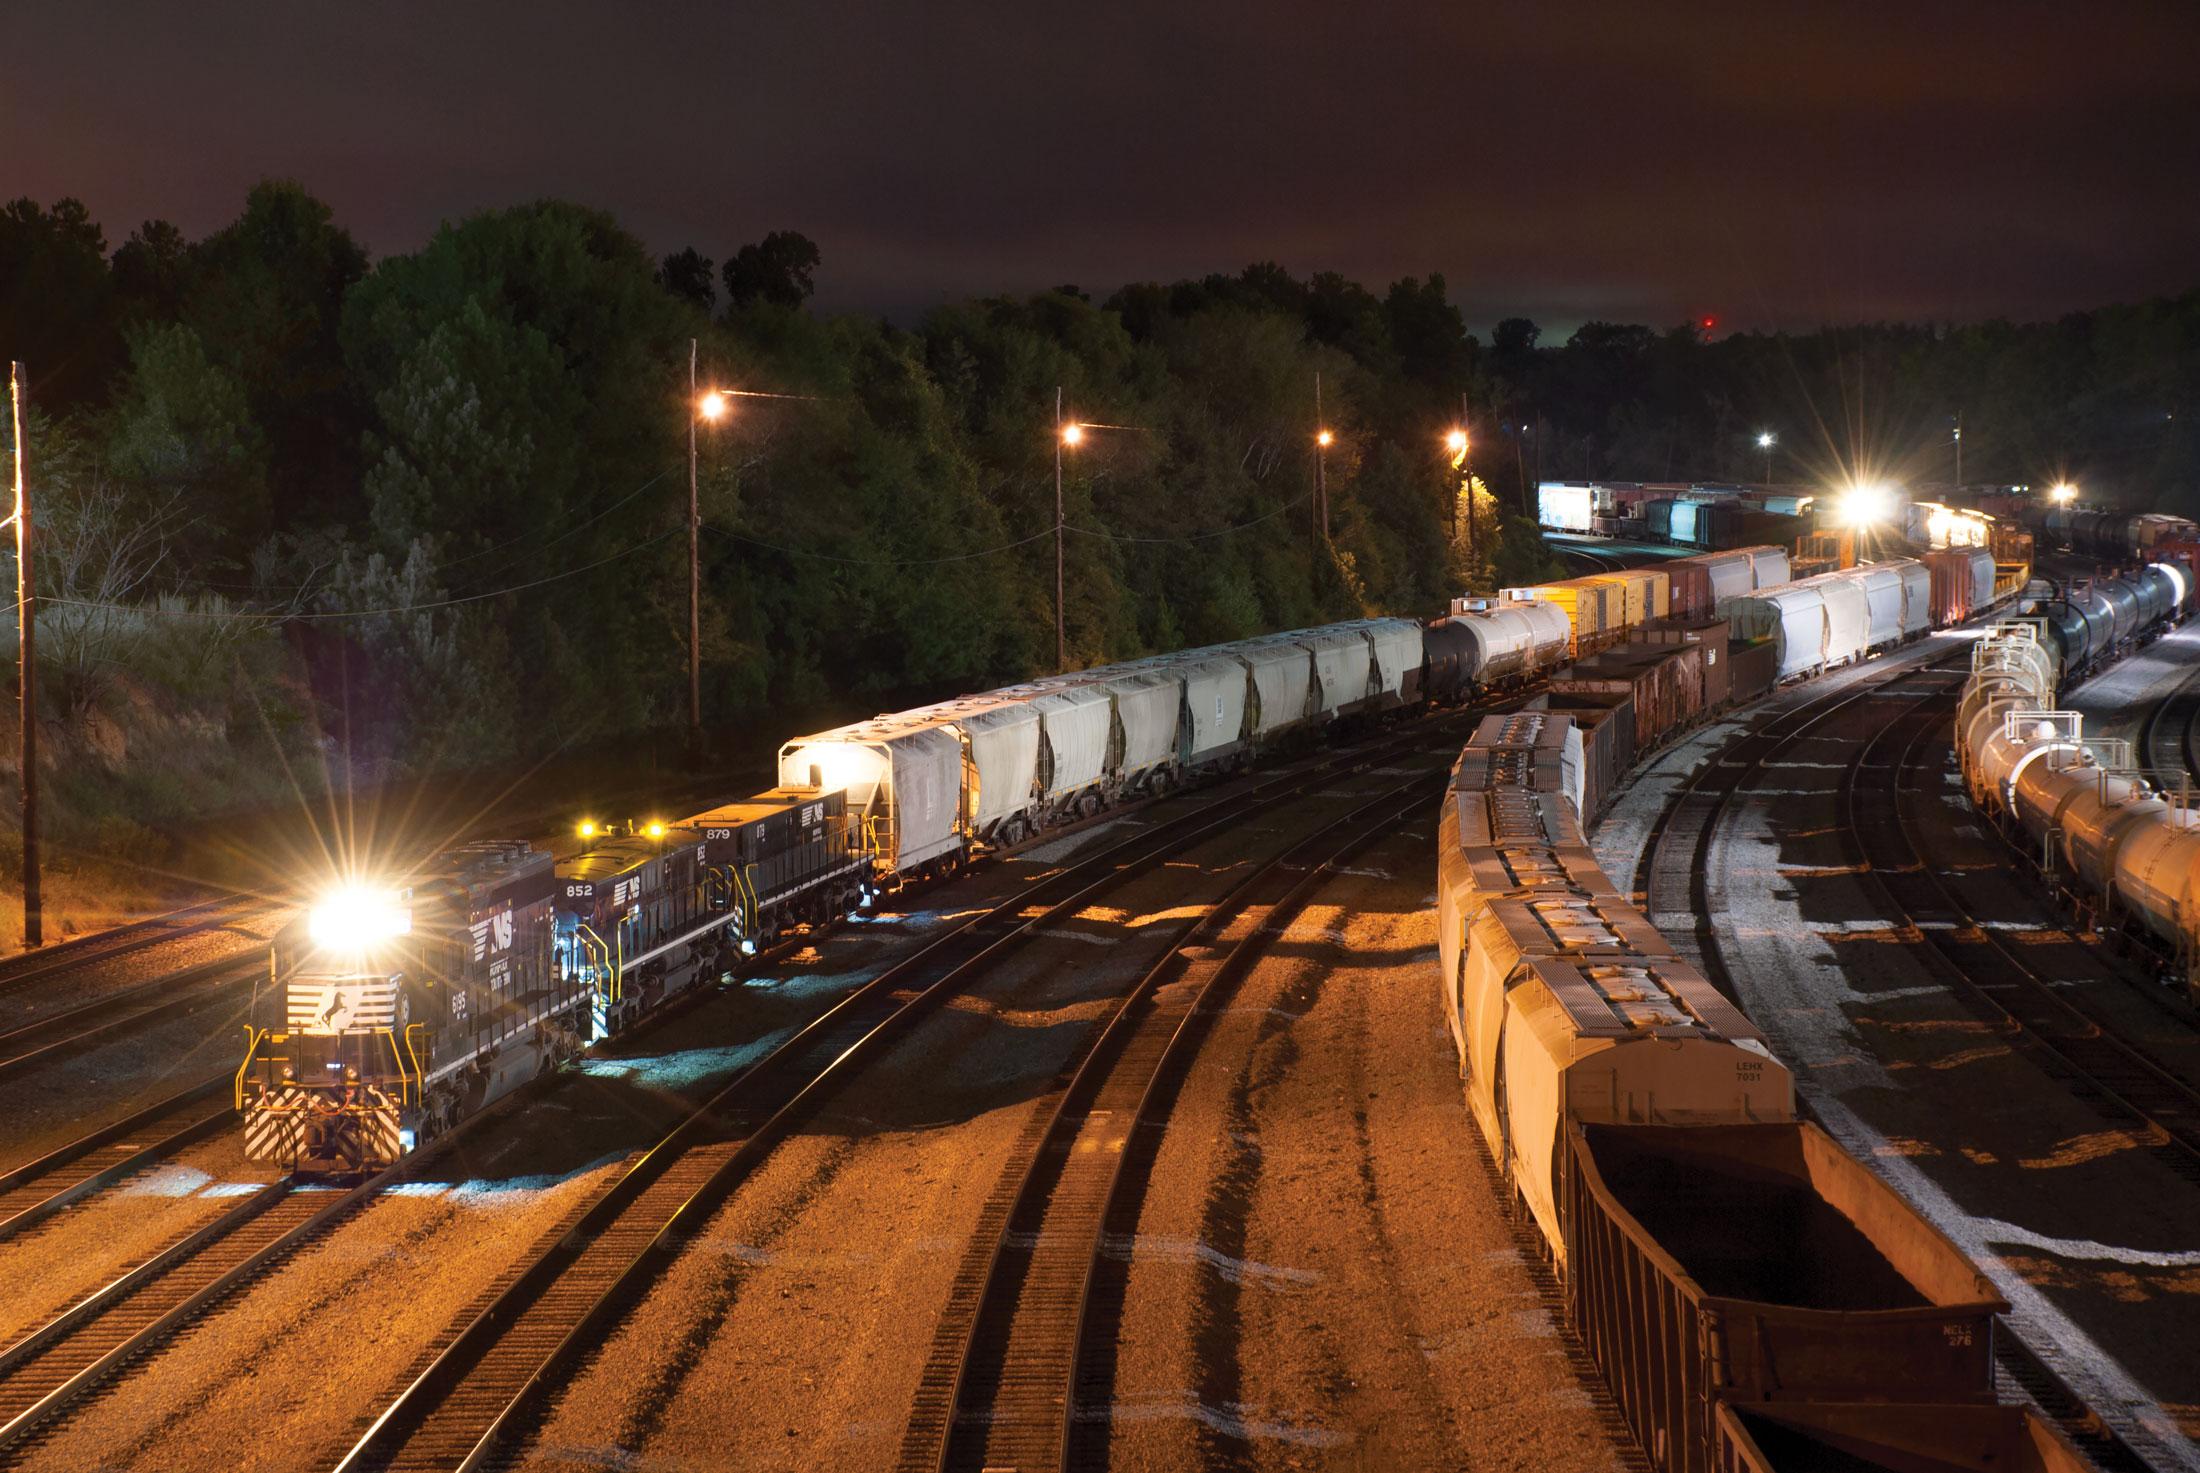 Rail yard at night.